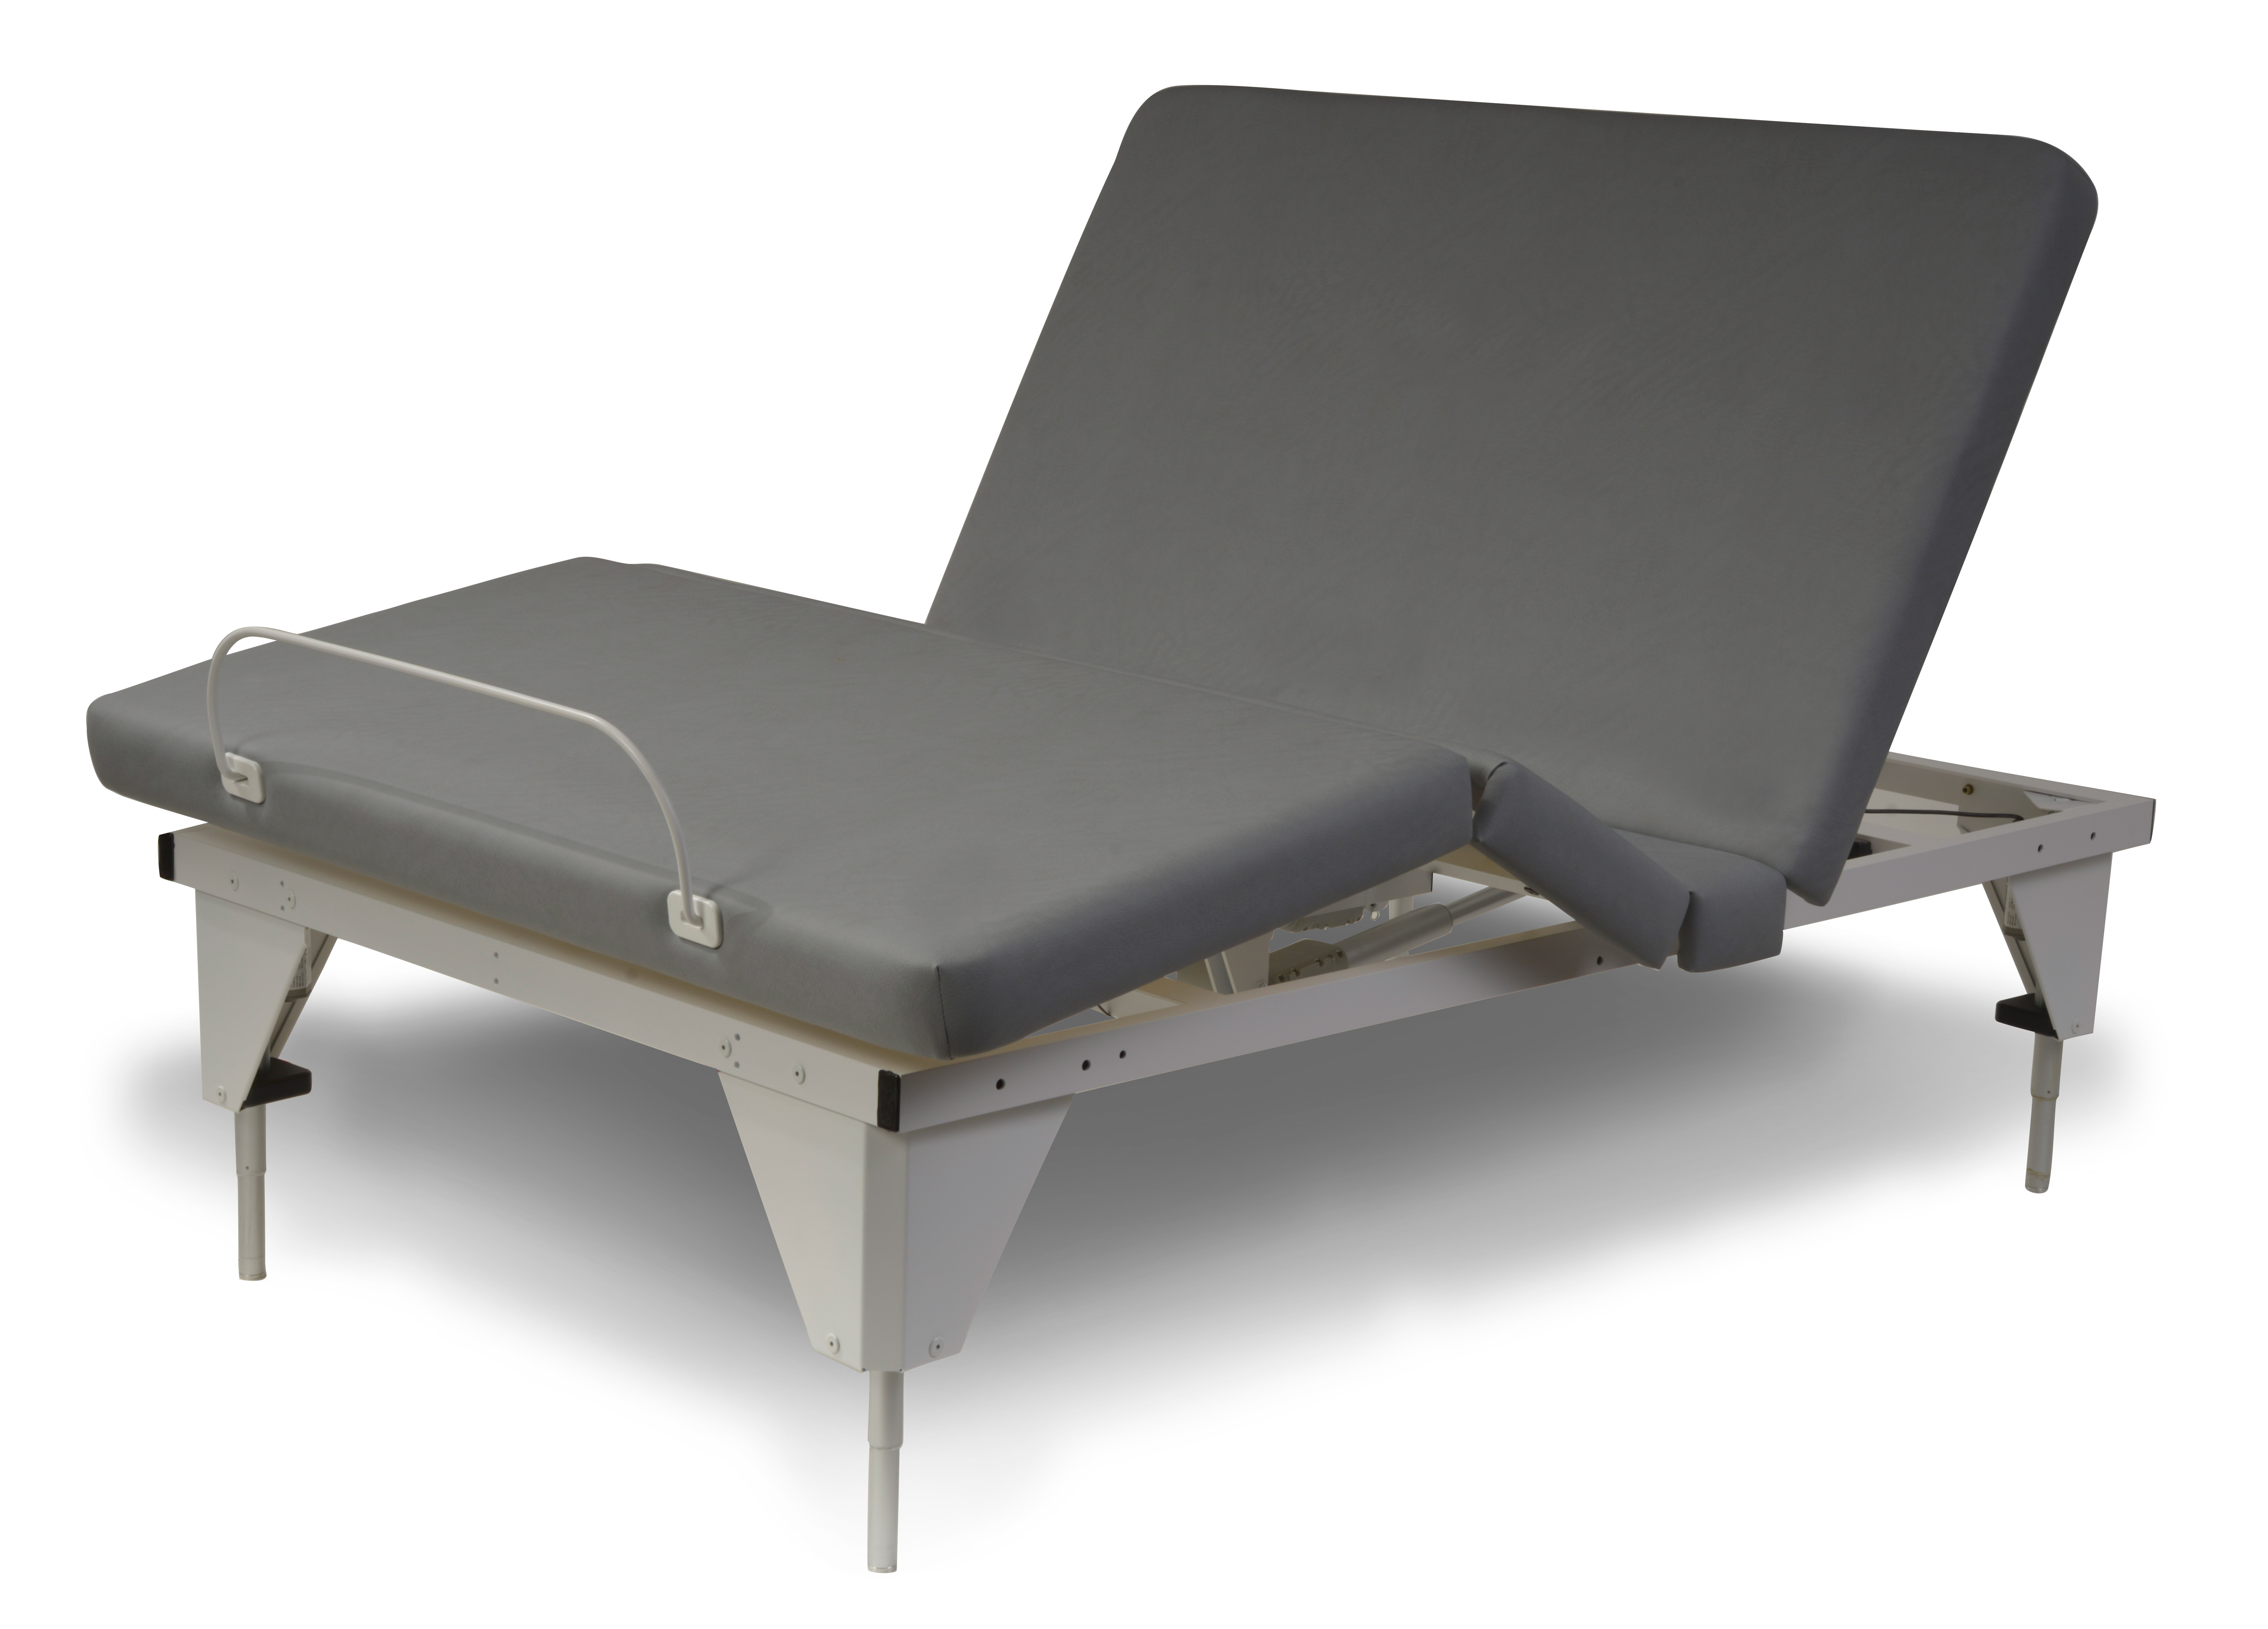 Assured Comfort Hi-Low Adjustable Bed - Signature Queen - Articulation - Foundation only.